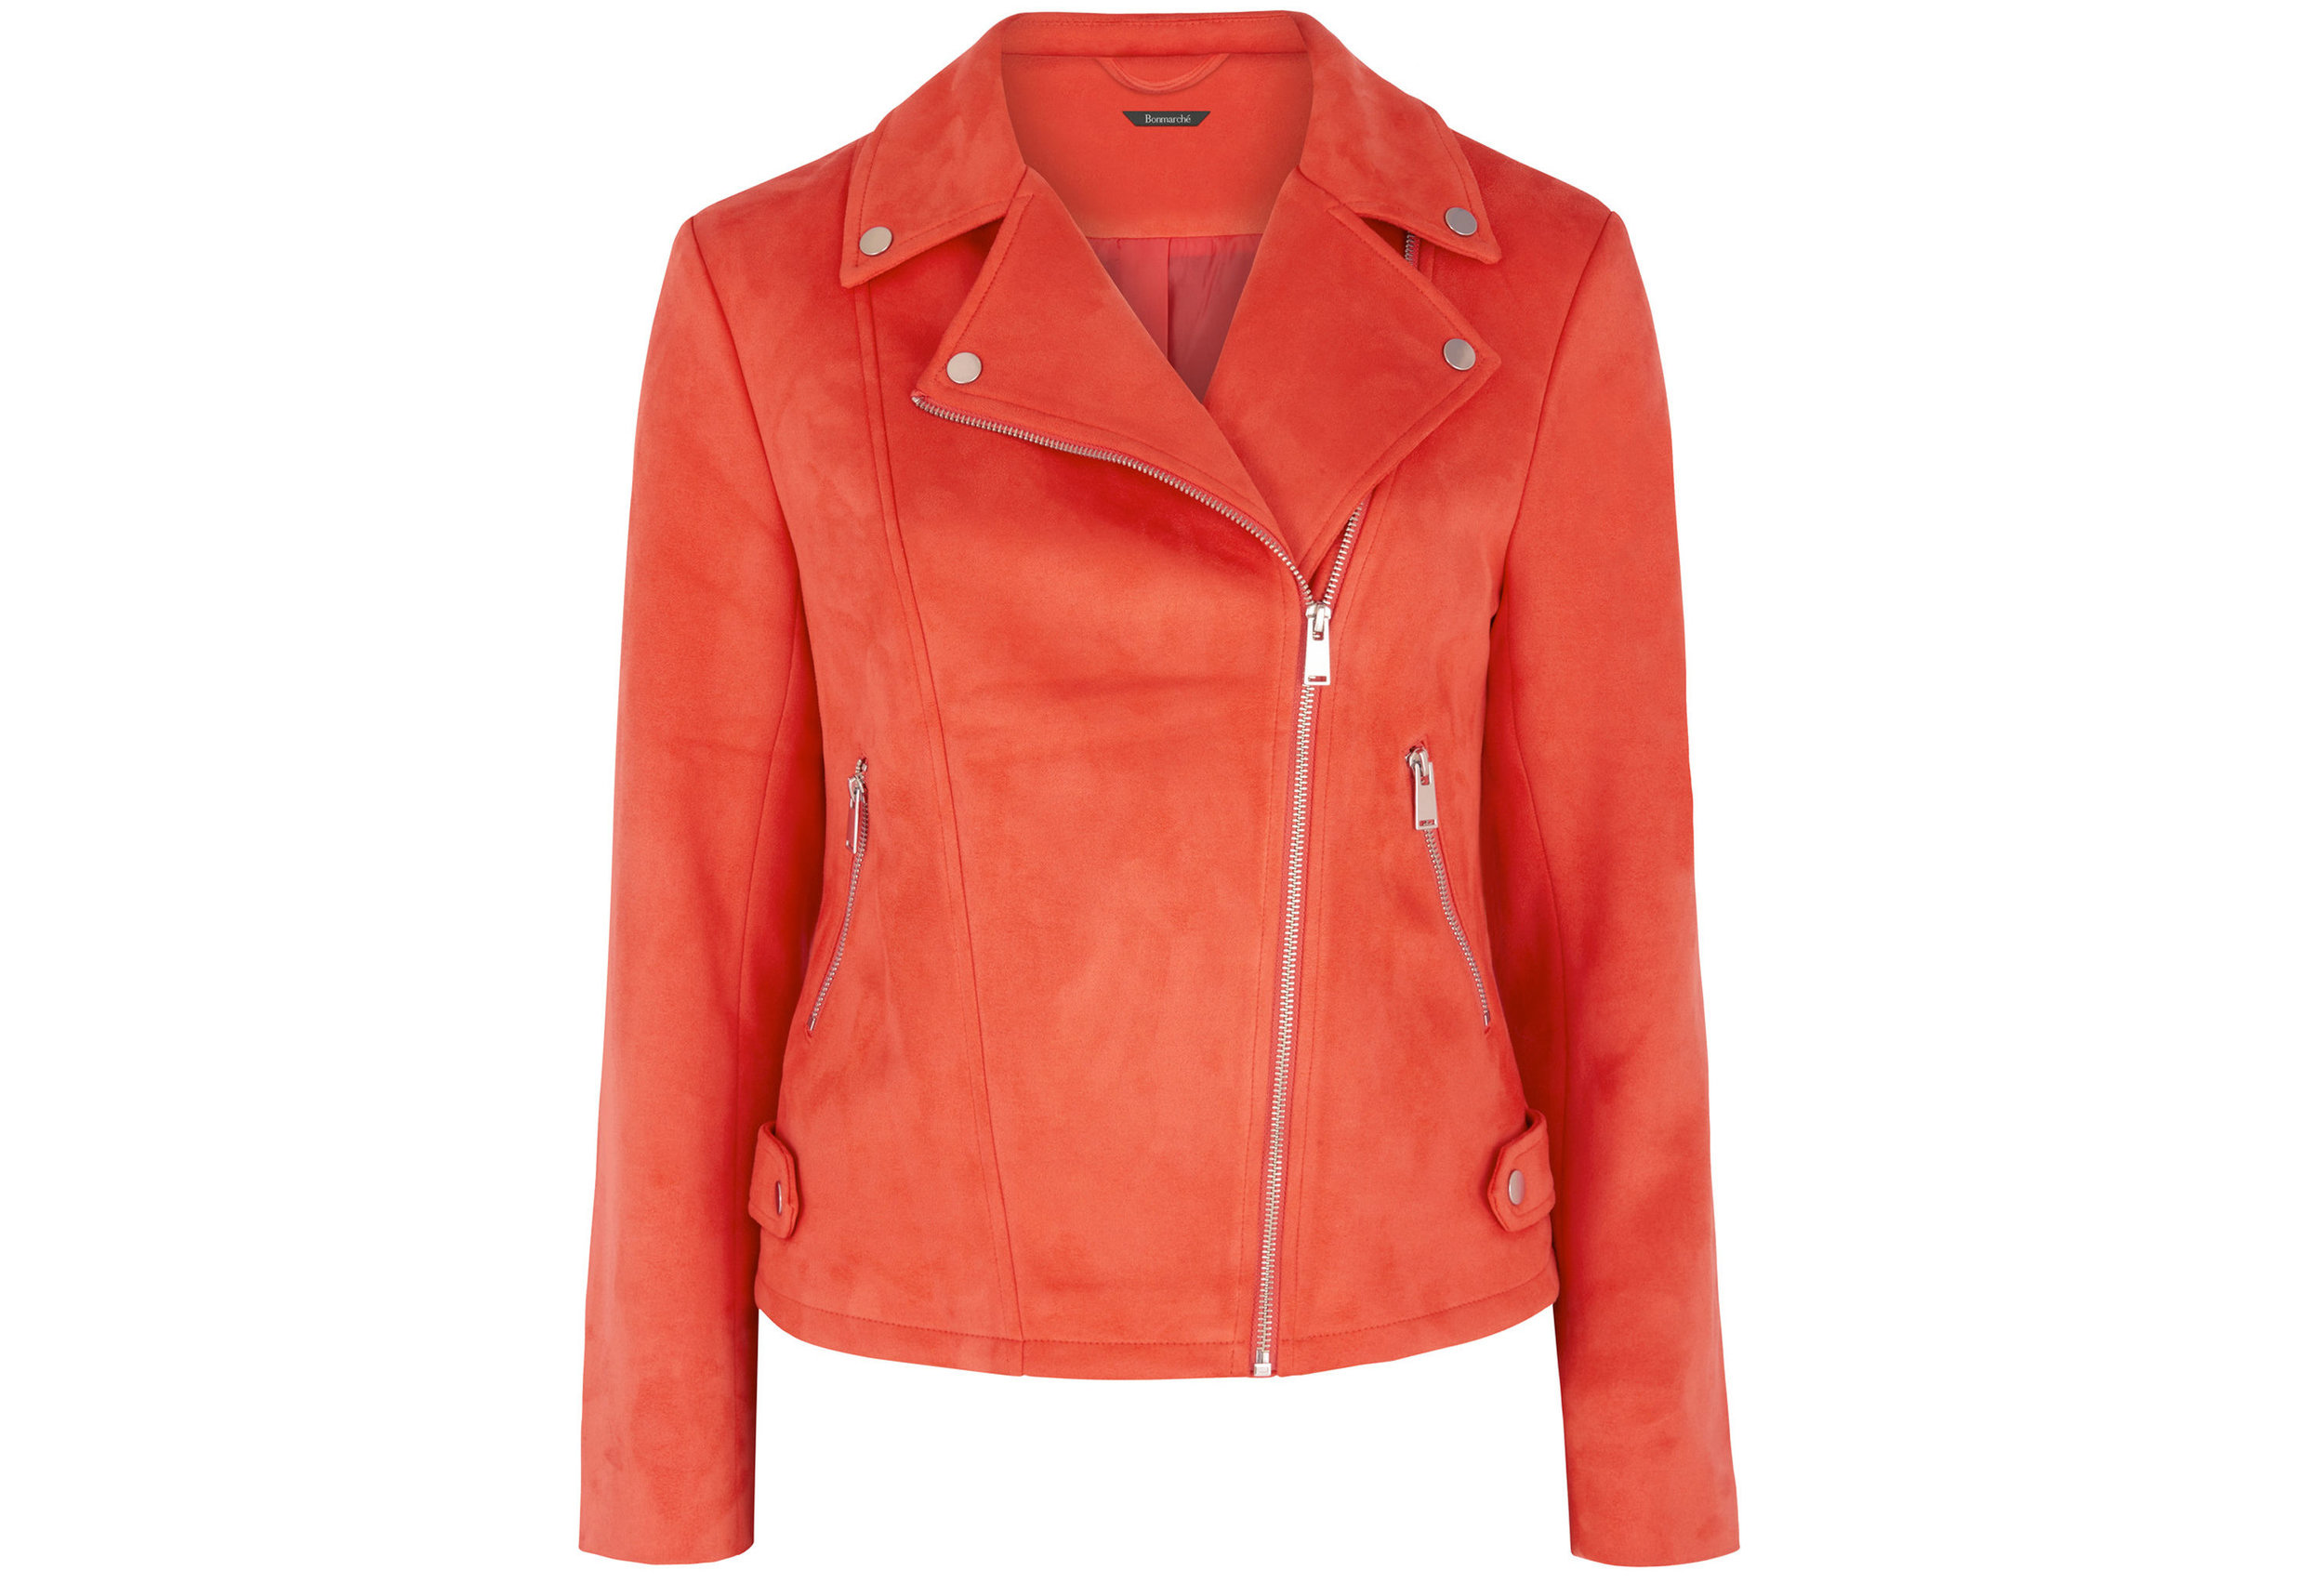 6. Bonmarche Red Suedette Biker Jacket